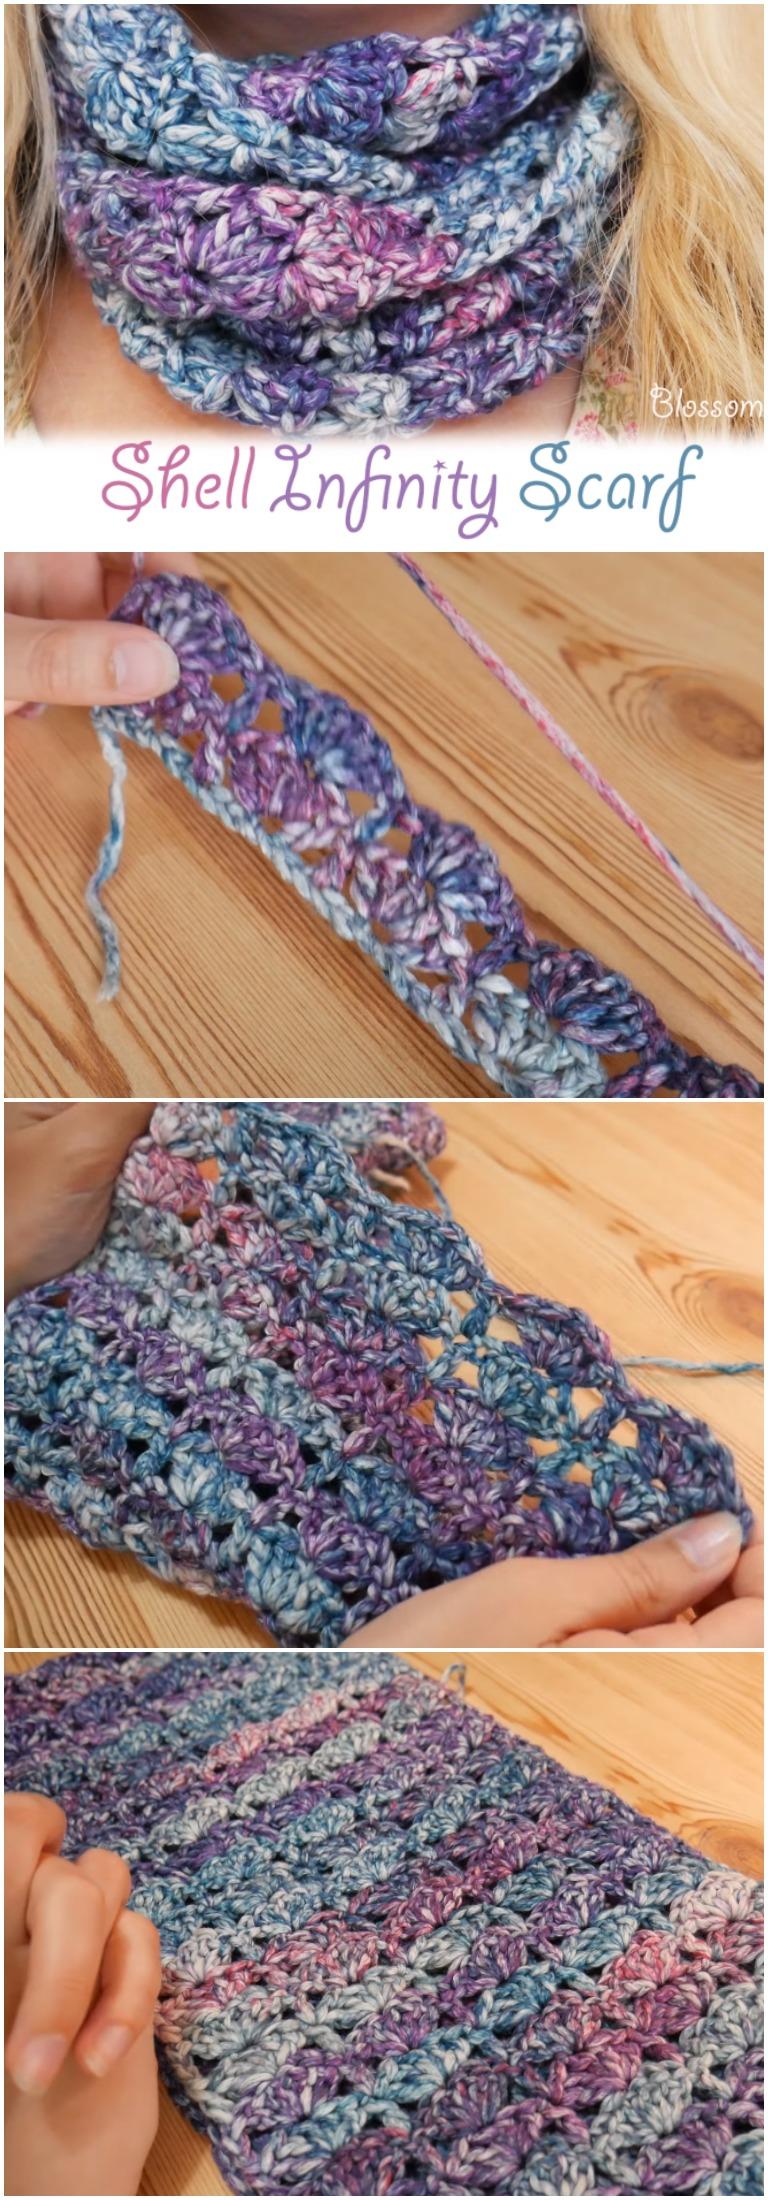 Crochet Shell Infinity Scarf